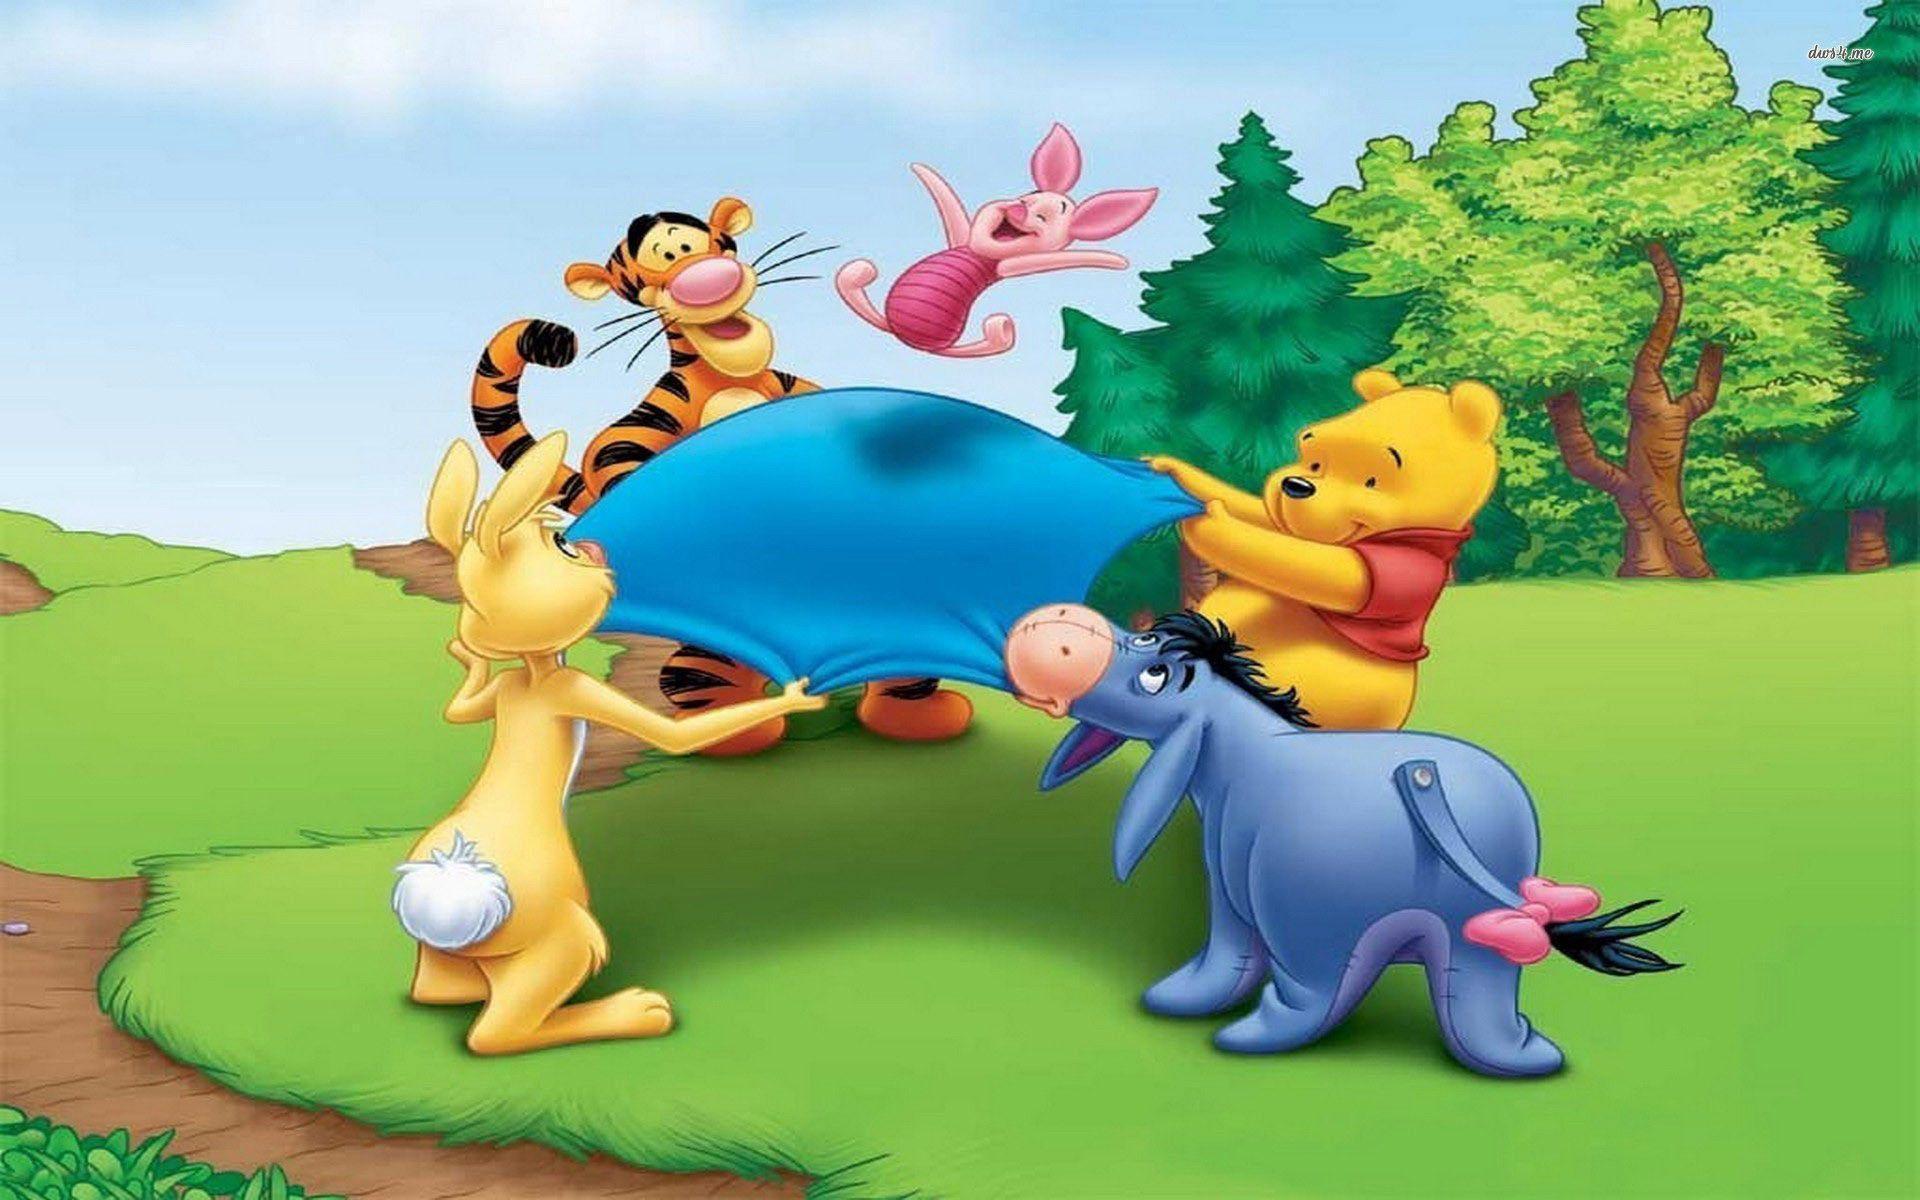 Wallpaper Winnie The Pooh: Winnie The Pooh Wallpapers